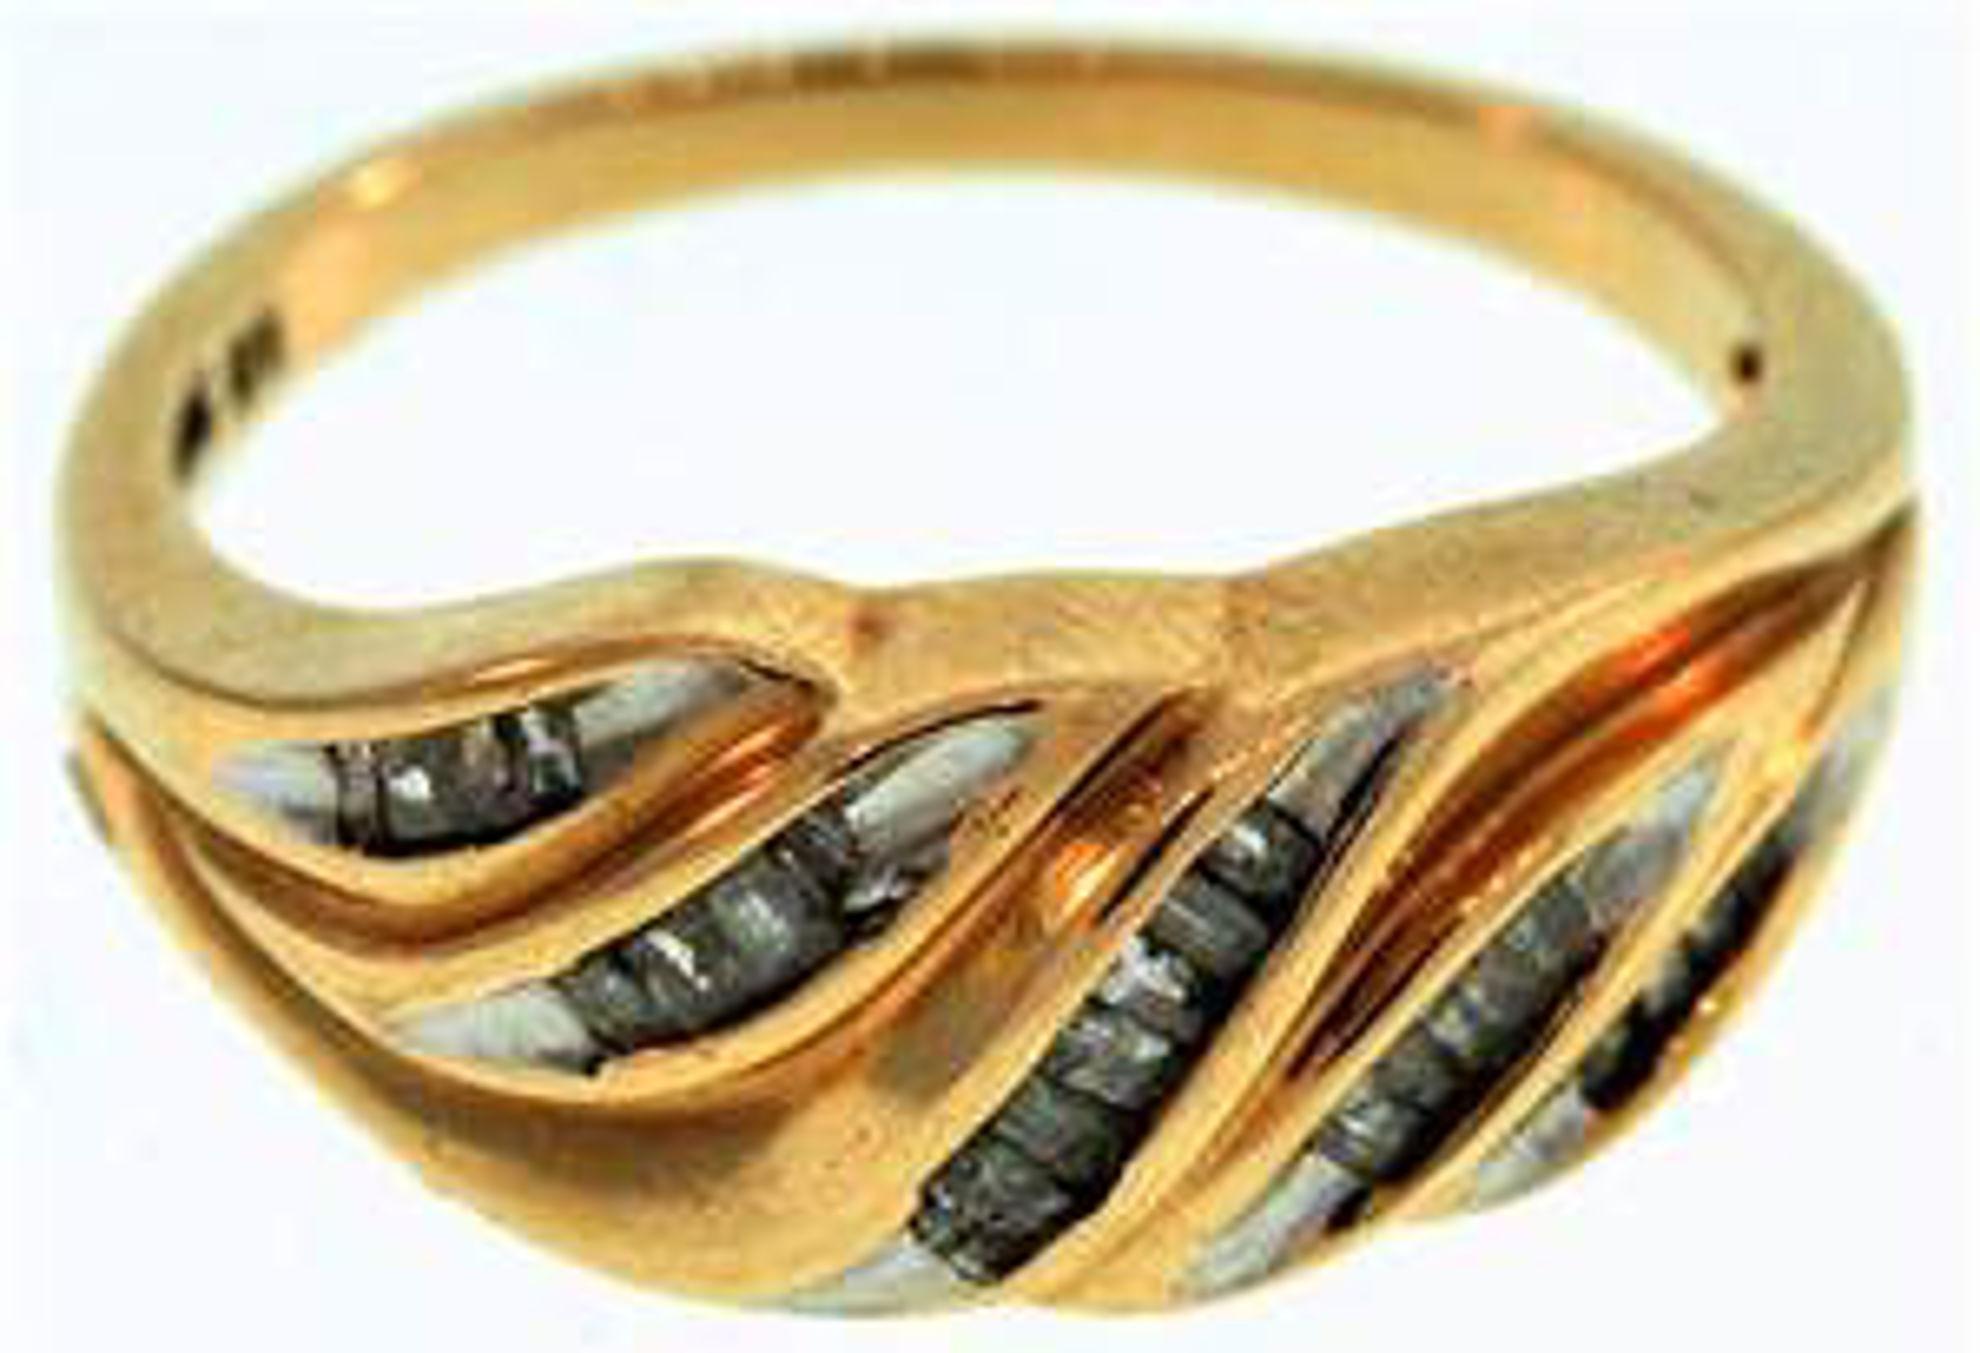 Picture of Ladies' Rings 10kt-2.0 DWT, 3.1 Grams